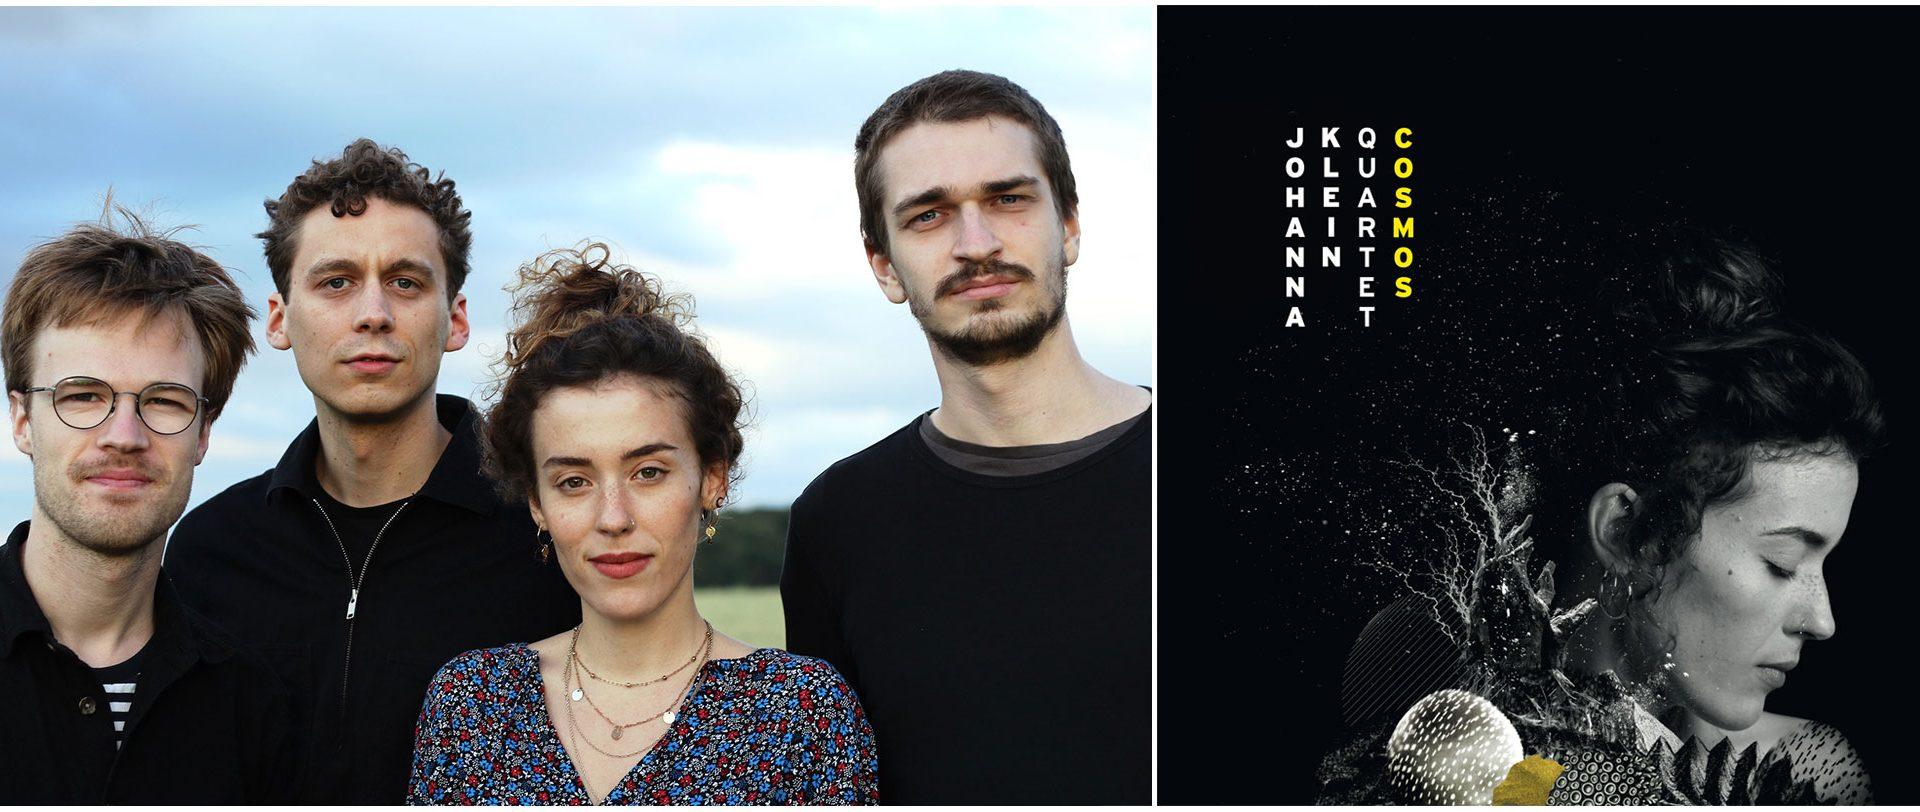 Johanna Klein, Leo Engels, Nicolai Amrehn, Jan Philipp, COSMOS, CD-Release, LOFT